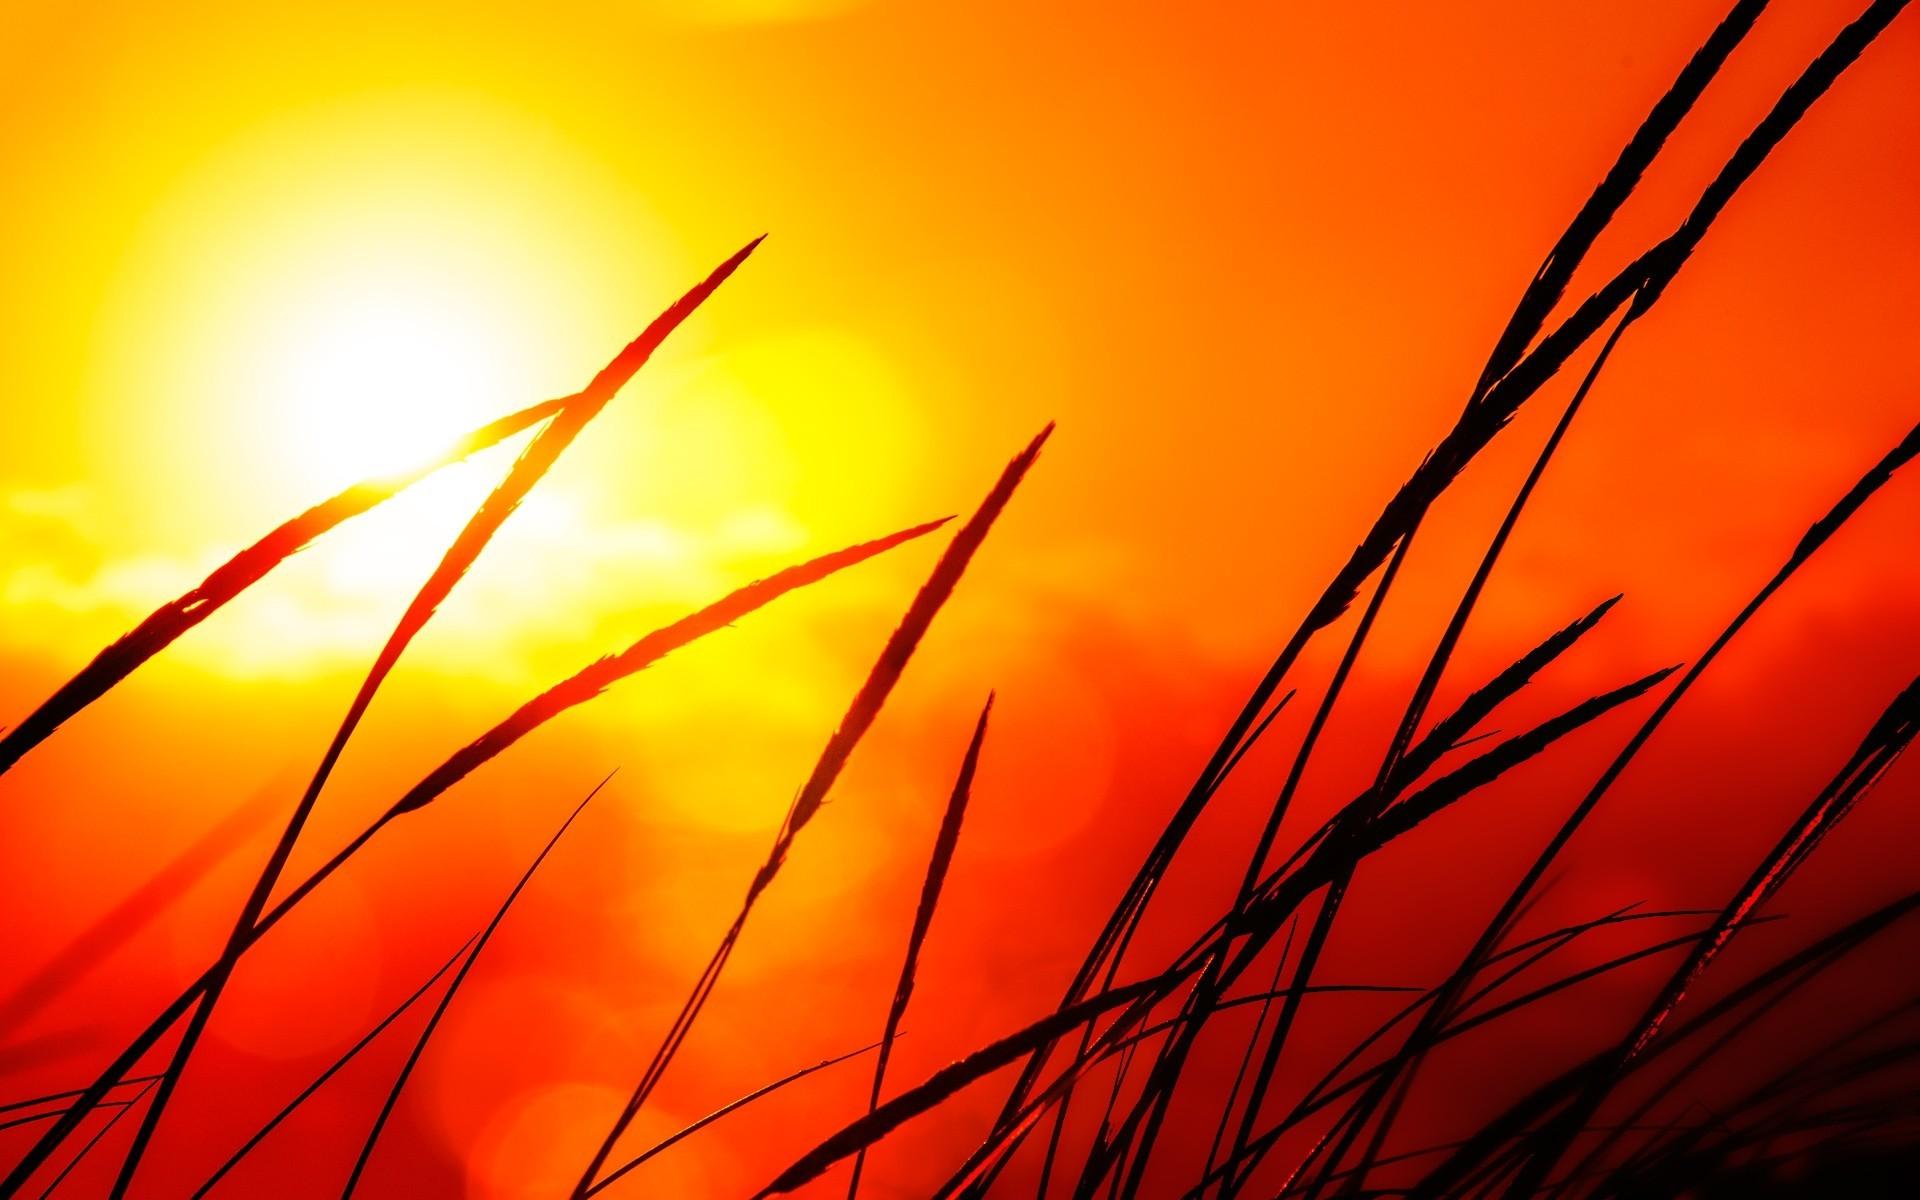 Hd Wallpaper Download Website 12 Pretty Hd Sunlight Wallpapers